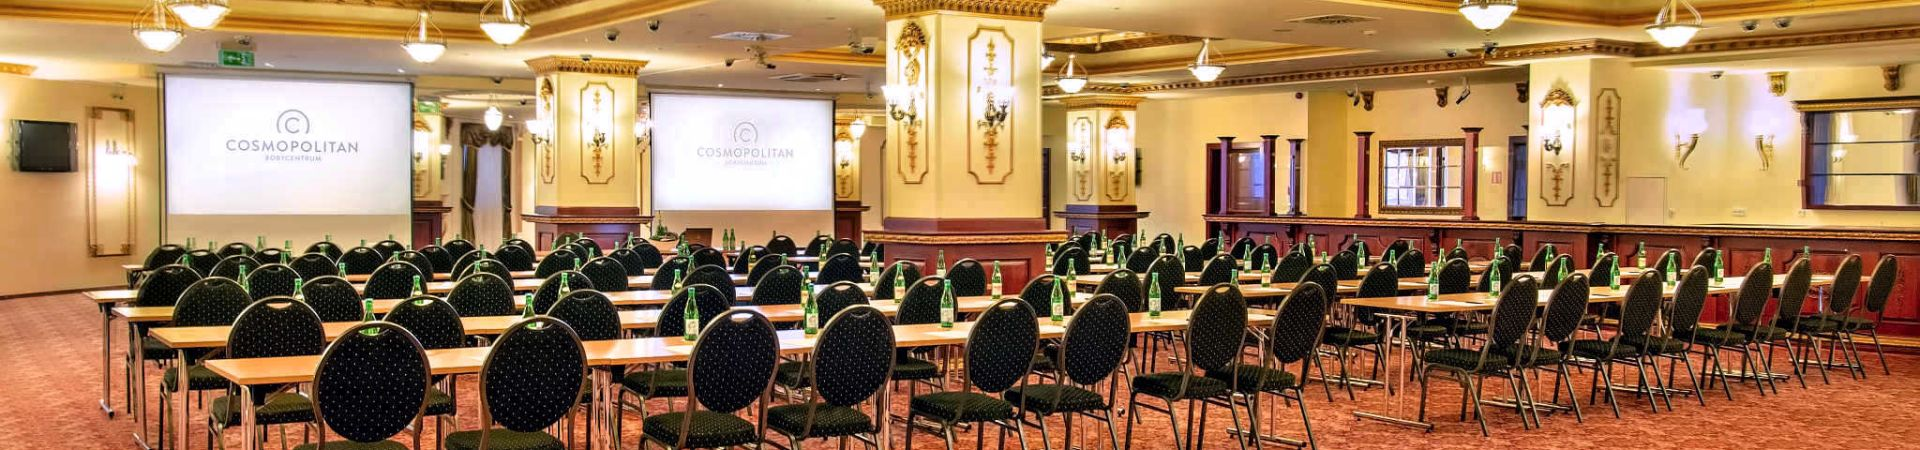 Hotel Cosmopolitan Bobycentrum - Sál Vídeň